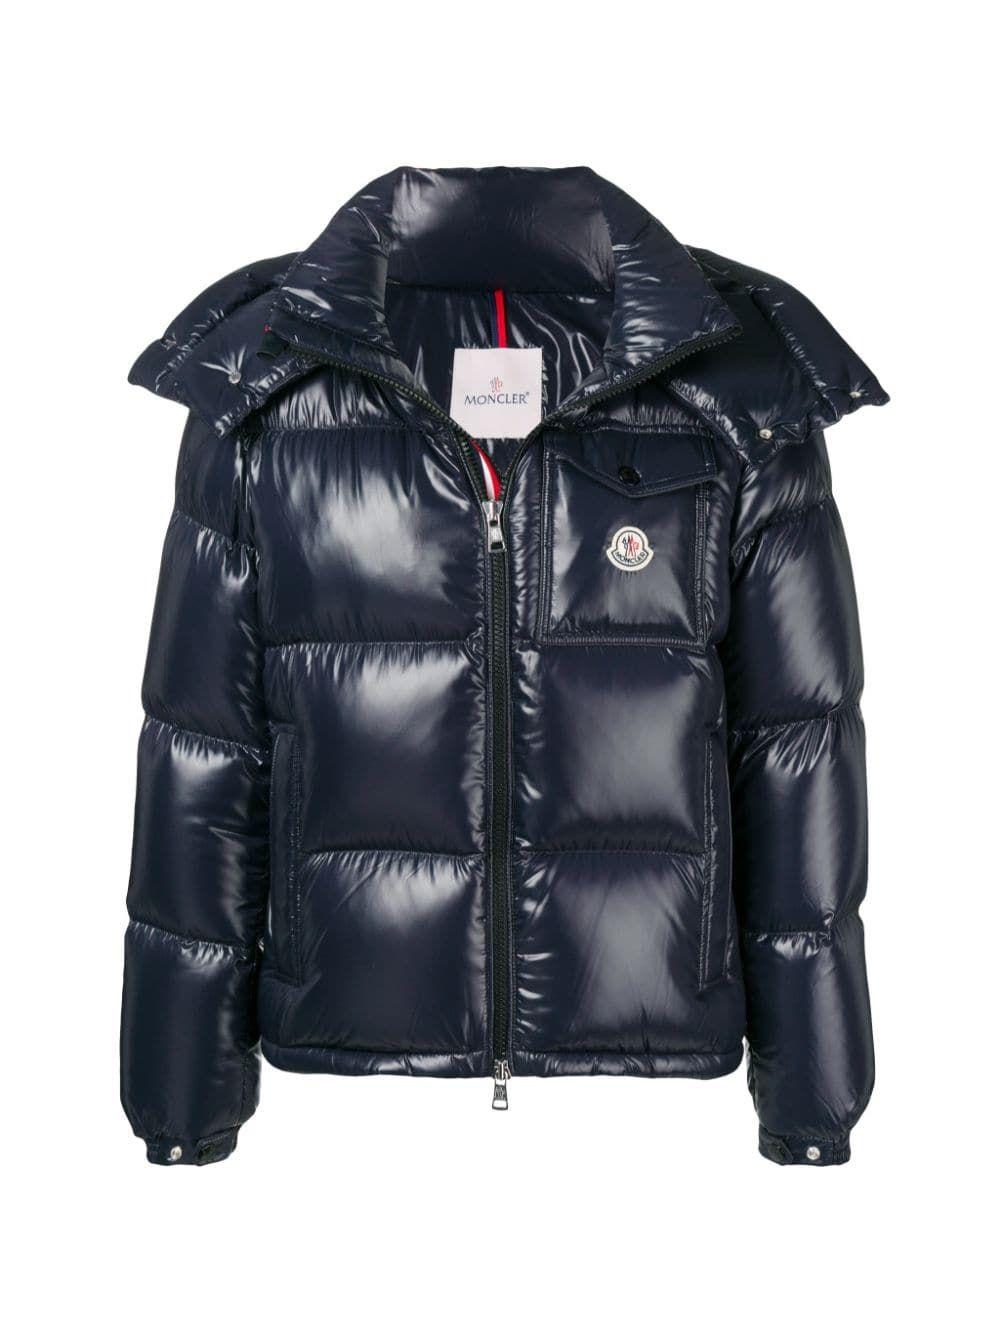 Moncler Padded Jacket In Blue Modesens Padded Jacket Jackets Moncler [ 1333 x 1000 Pixel ]